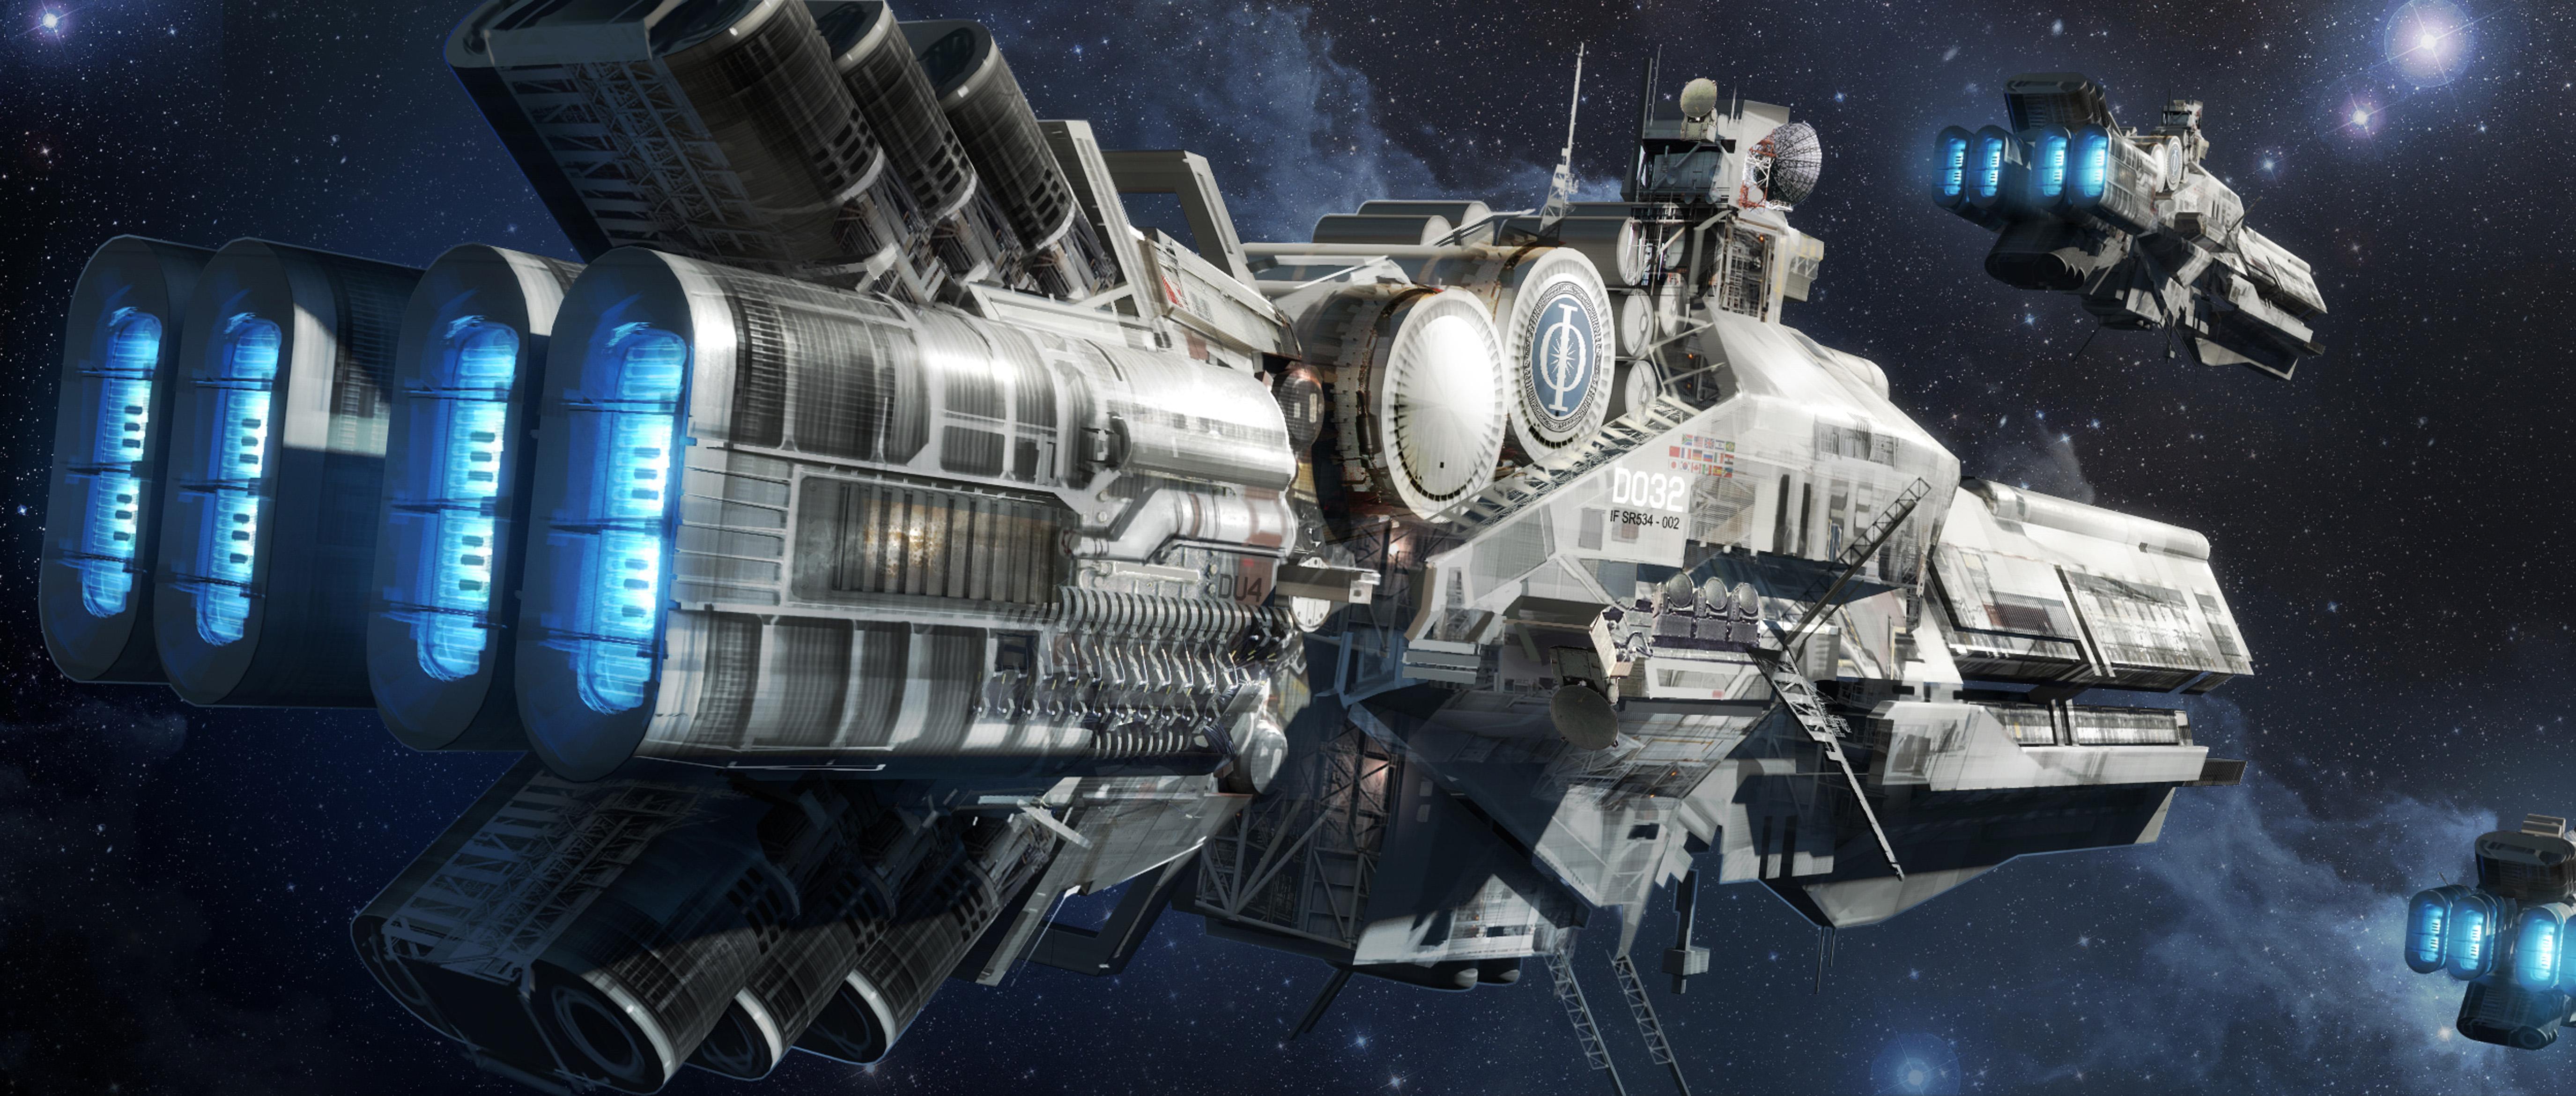 картинка Enders Game космос фантастика кино корабли техника